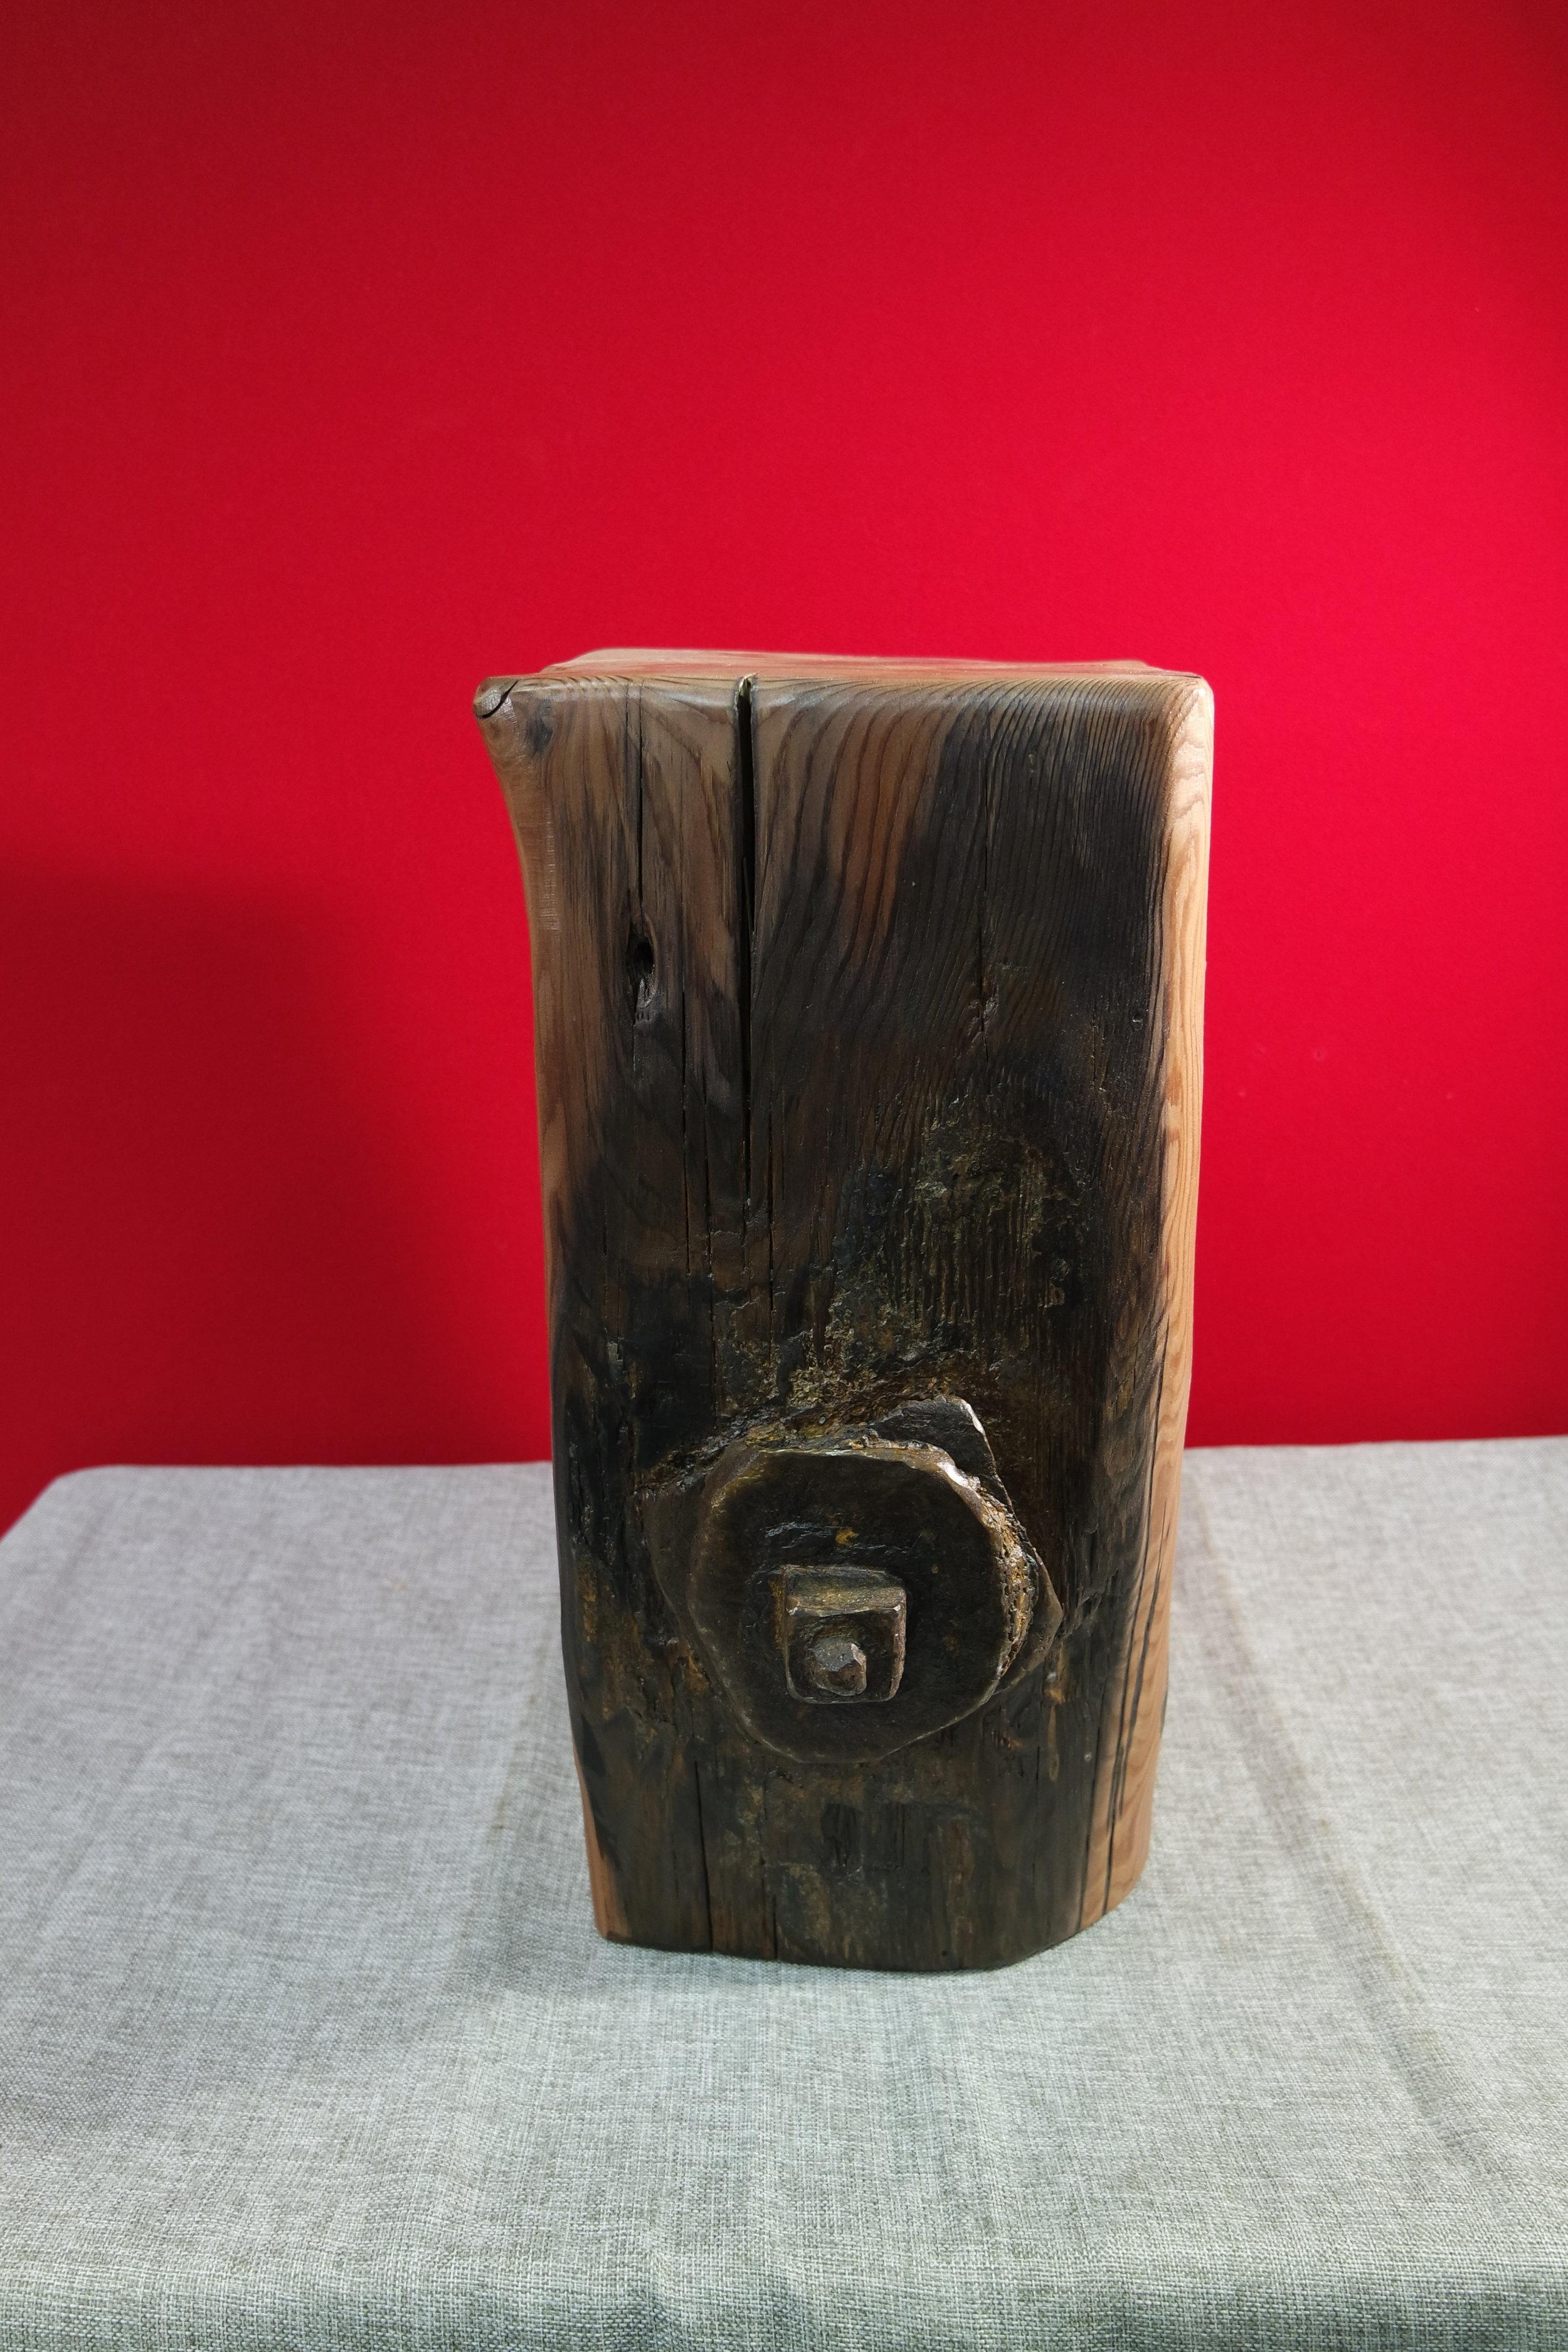 Driftwood Stool with Iron Bolt No I (21).JPG